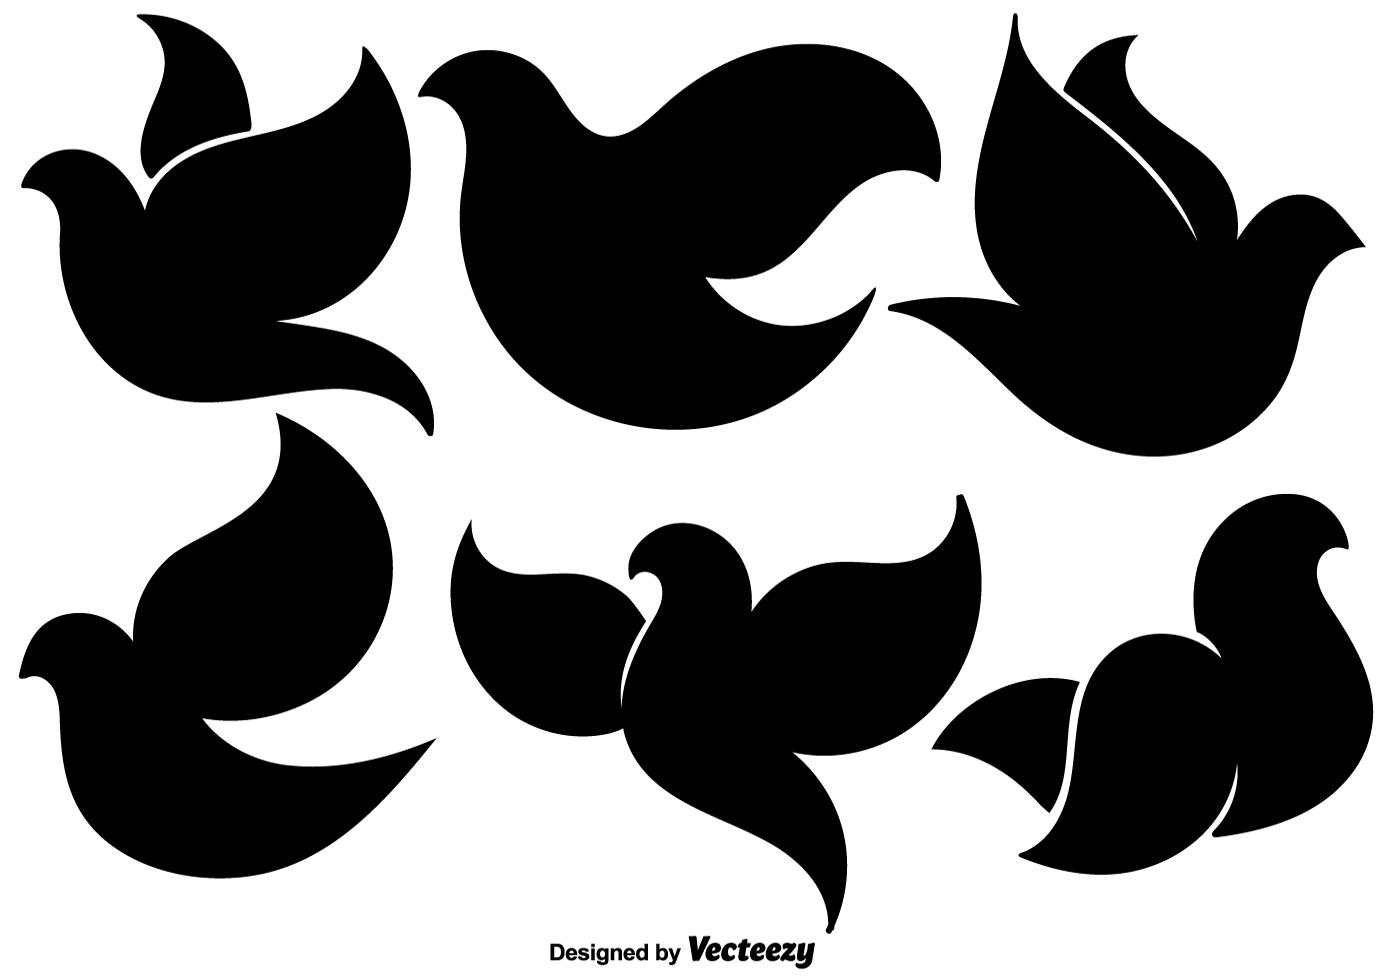 Black Dove Flat Icons Set - Download Free Vector Art ...